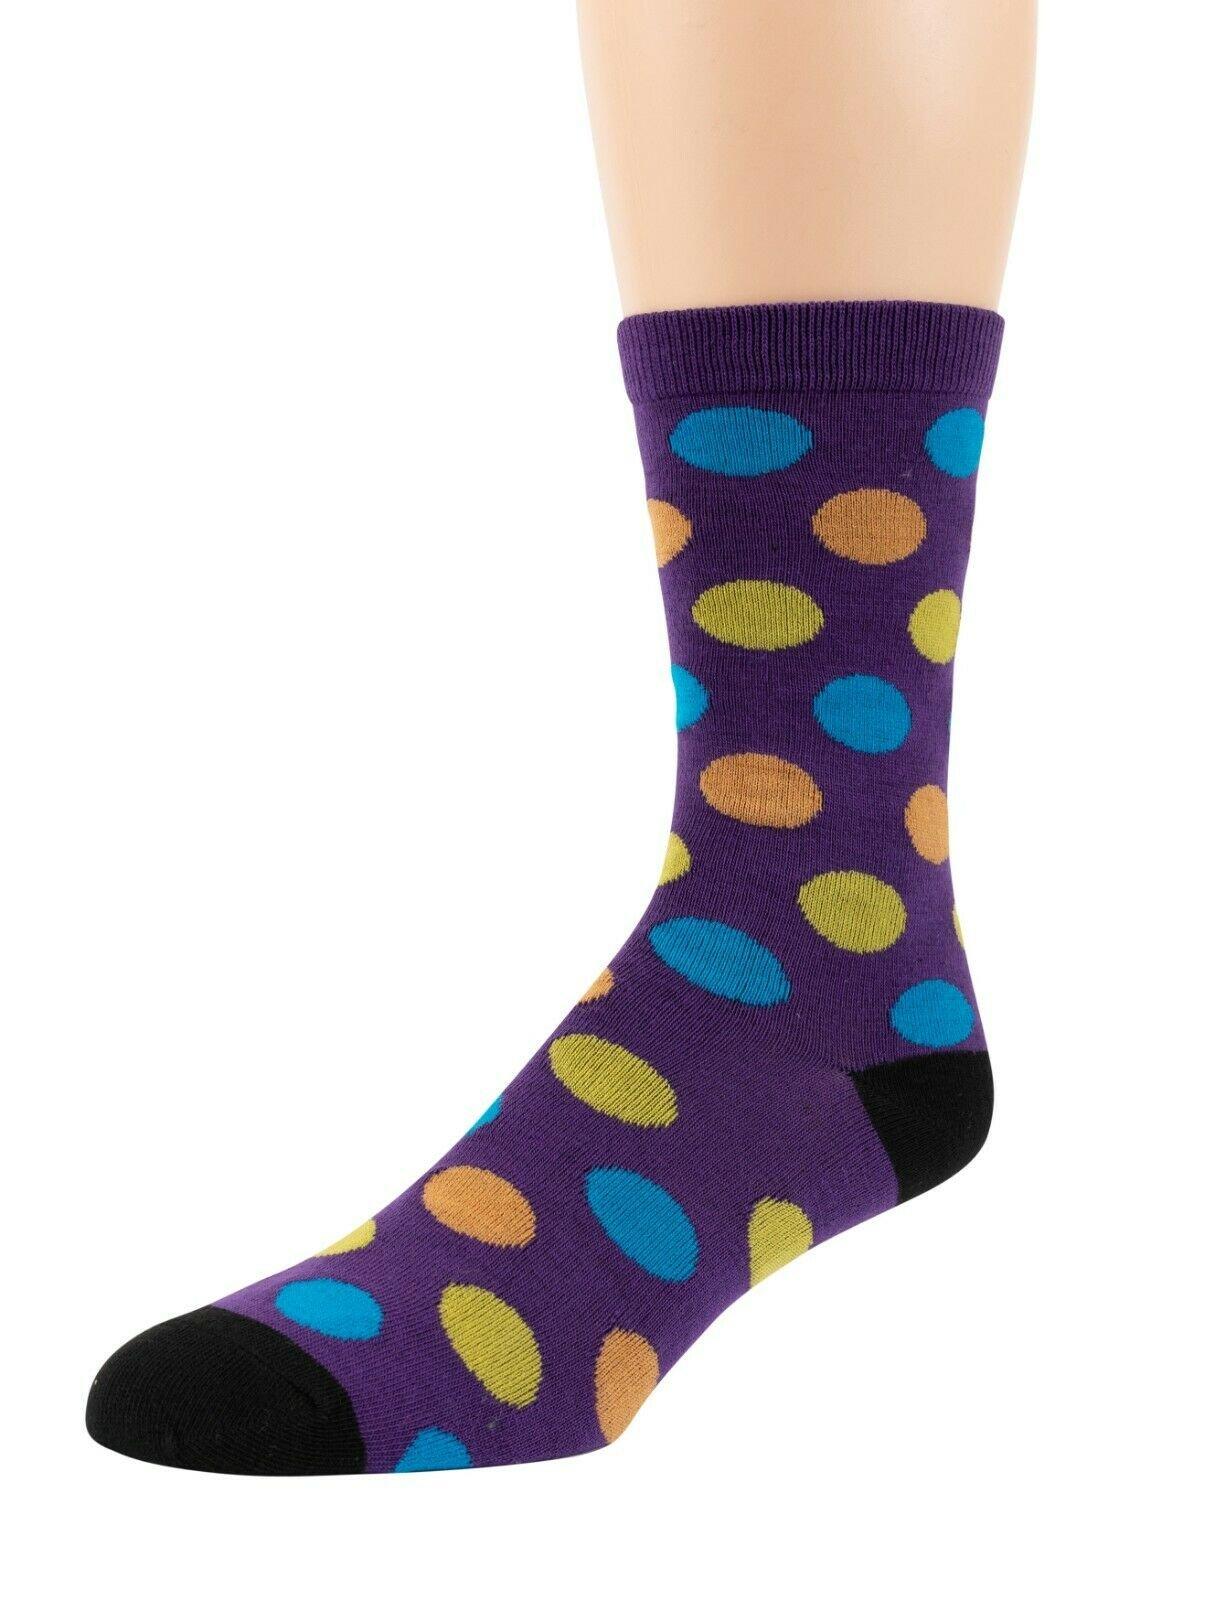 Mitch-Bogen-Mens-Cotton-Dress-Socks-Colorful-Fashion-Crew-Socks-8-Pack-Gift-Box thumbnail 15